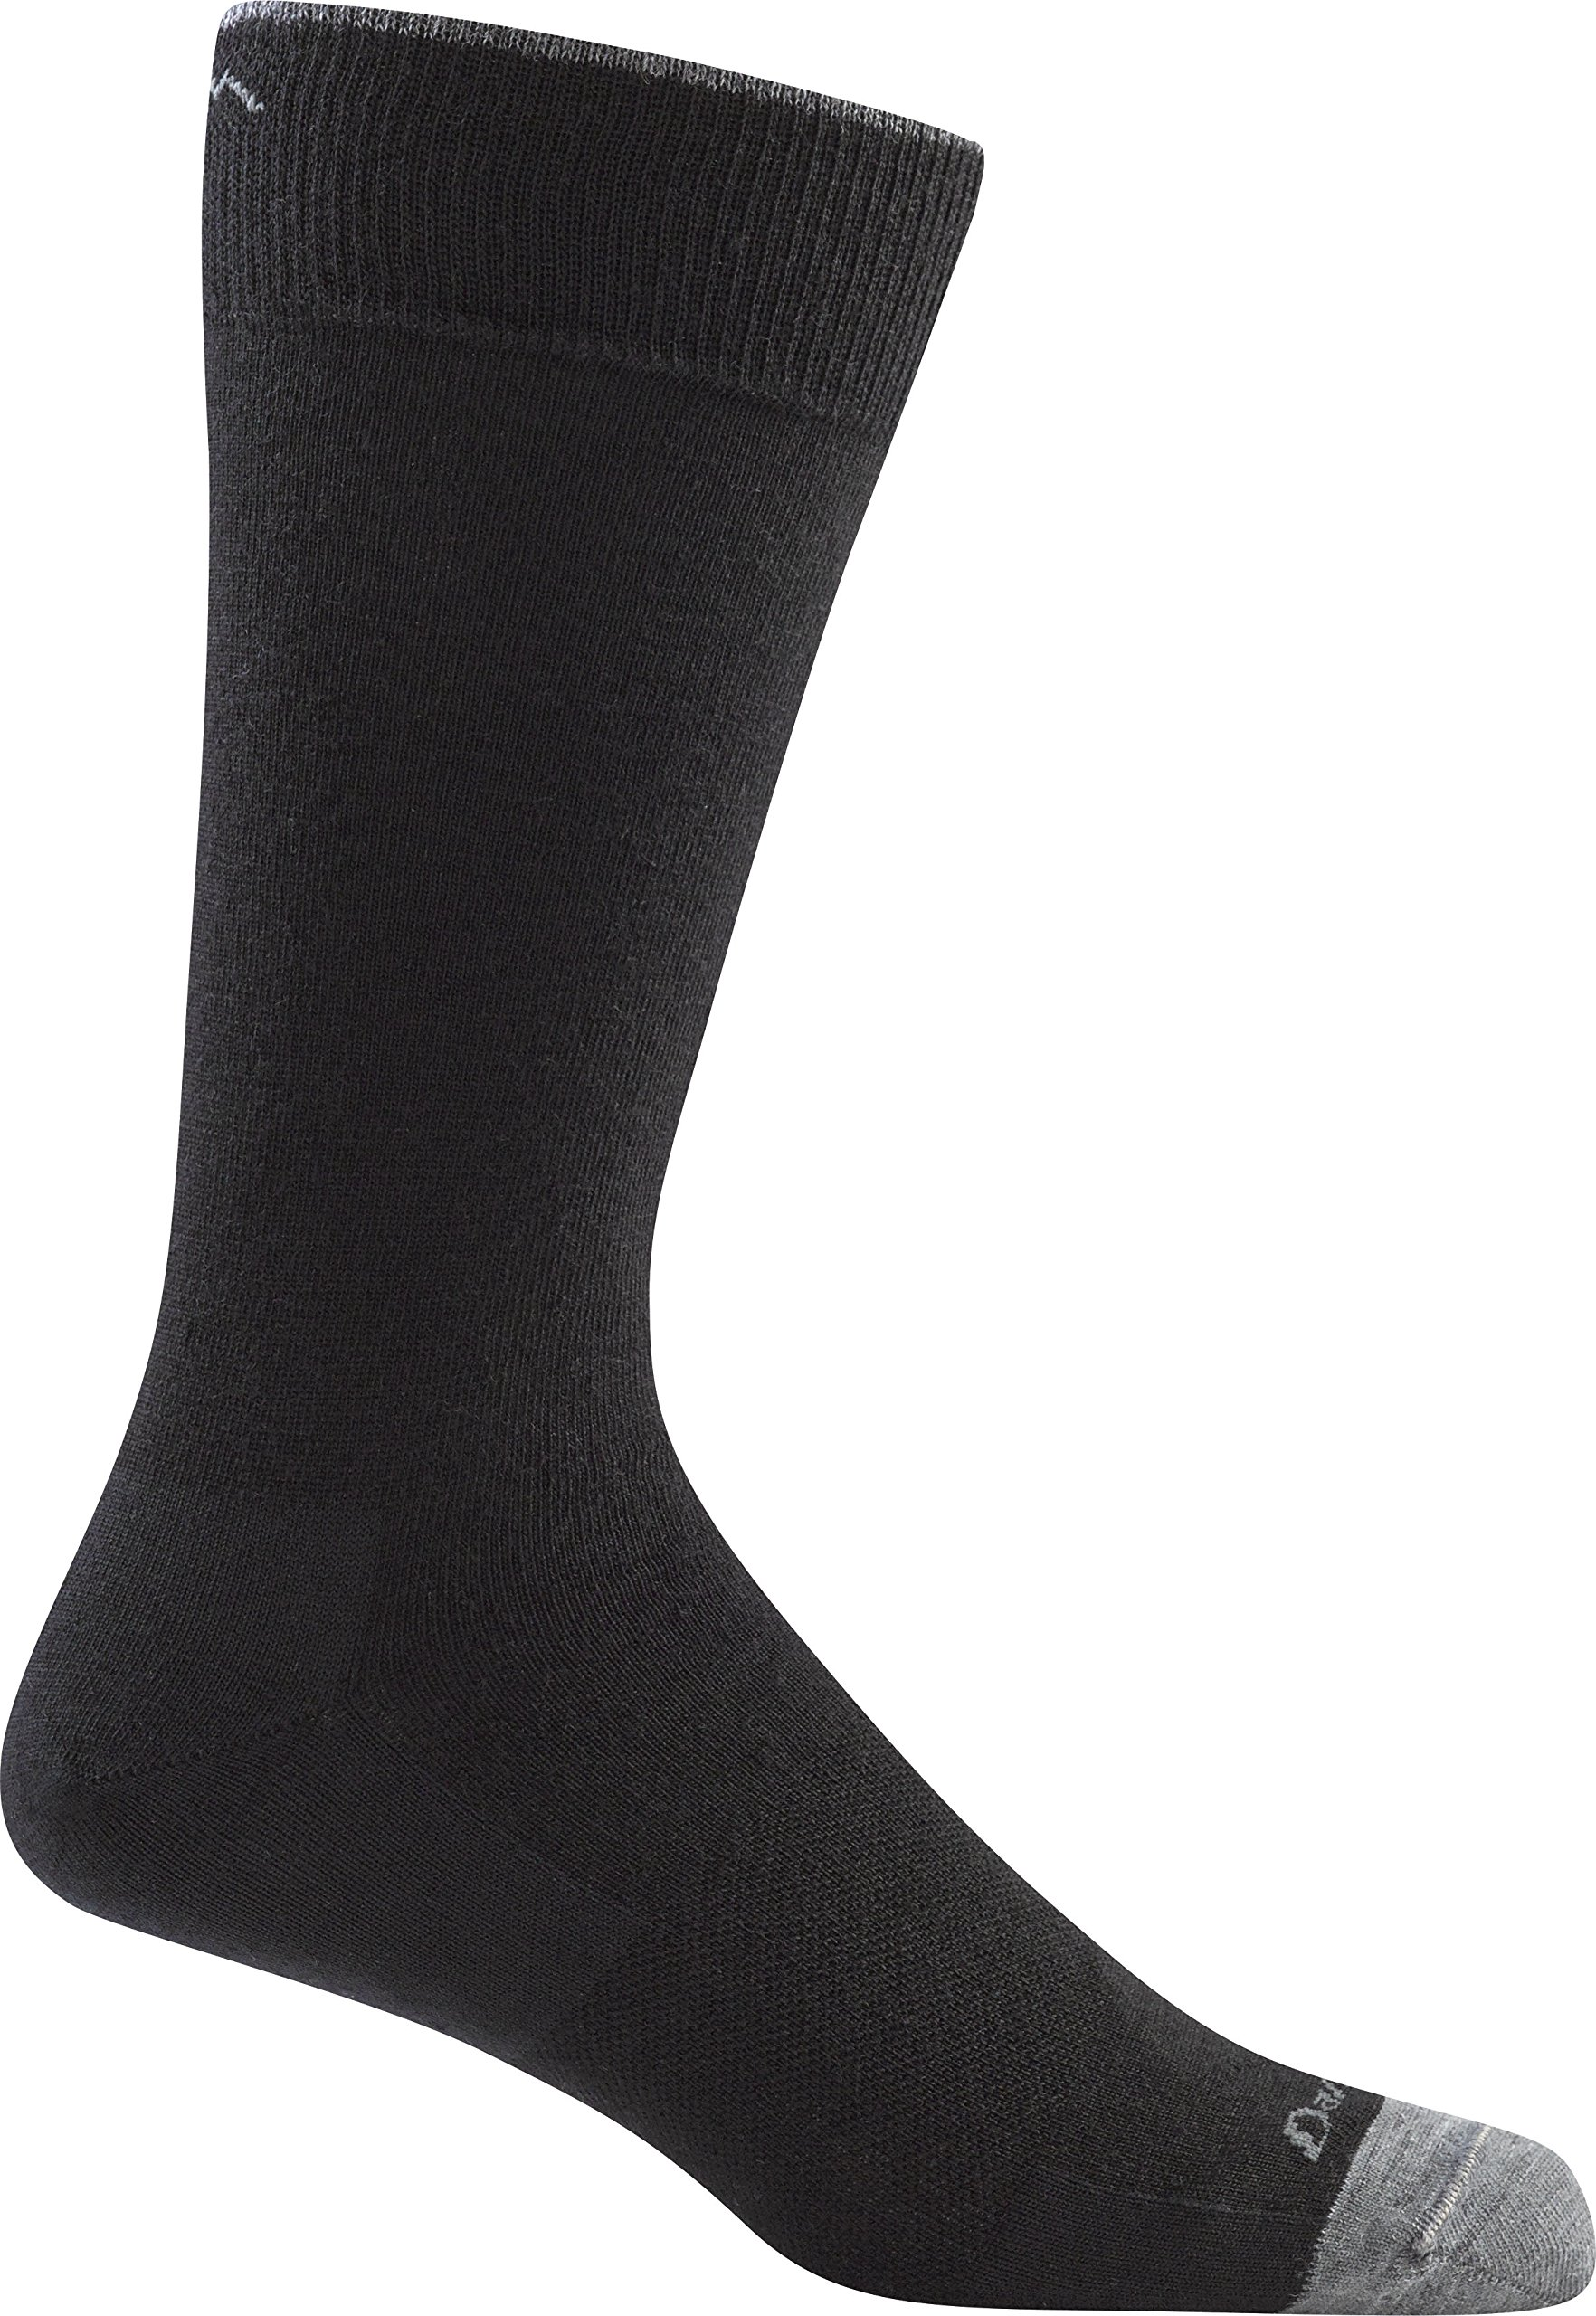 Darn Tough Men's Solid Crew Light Sock (Style 1617) Merino Wool, Black (Medium 8-9.5) - 6 Pack by Darn Tough